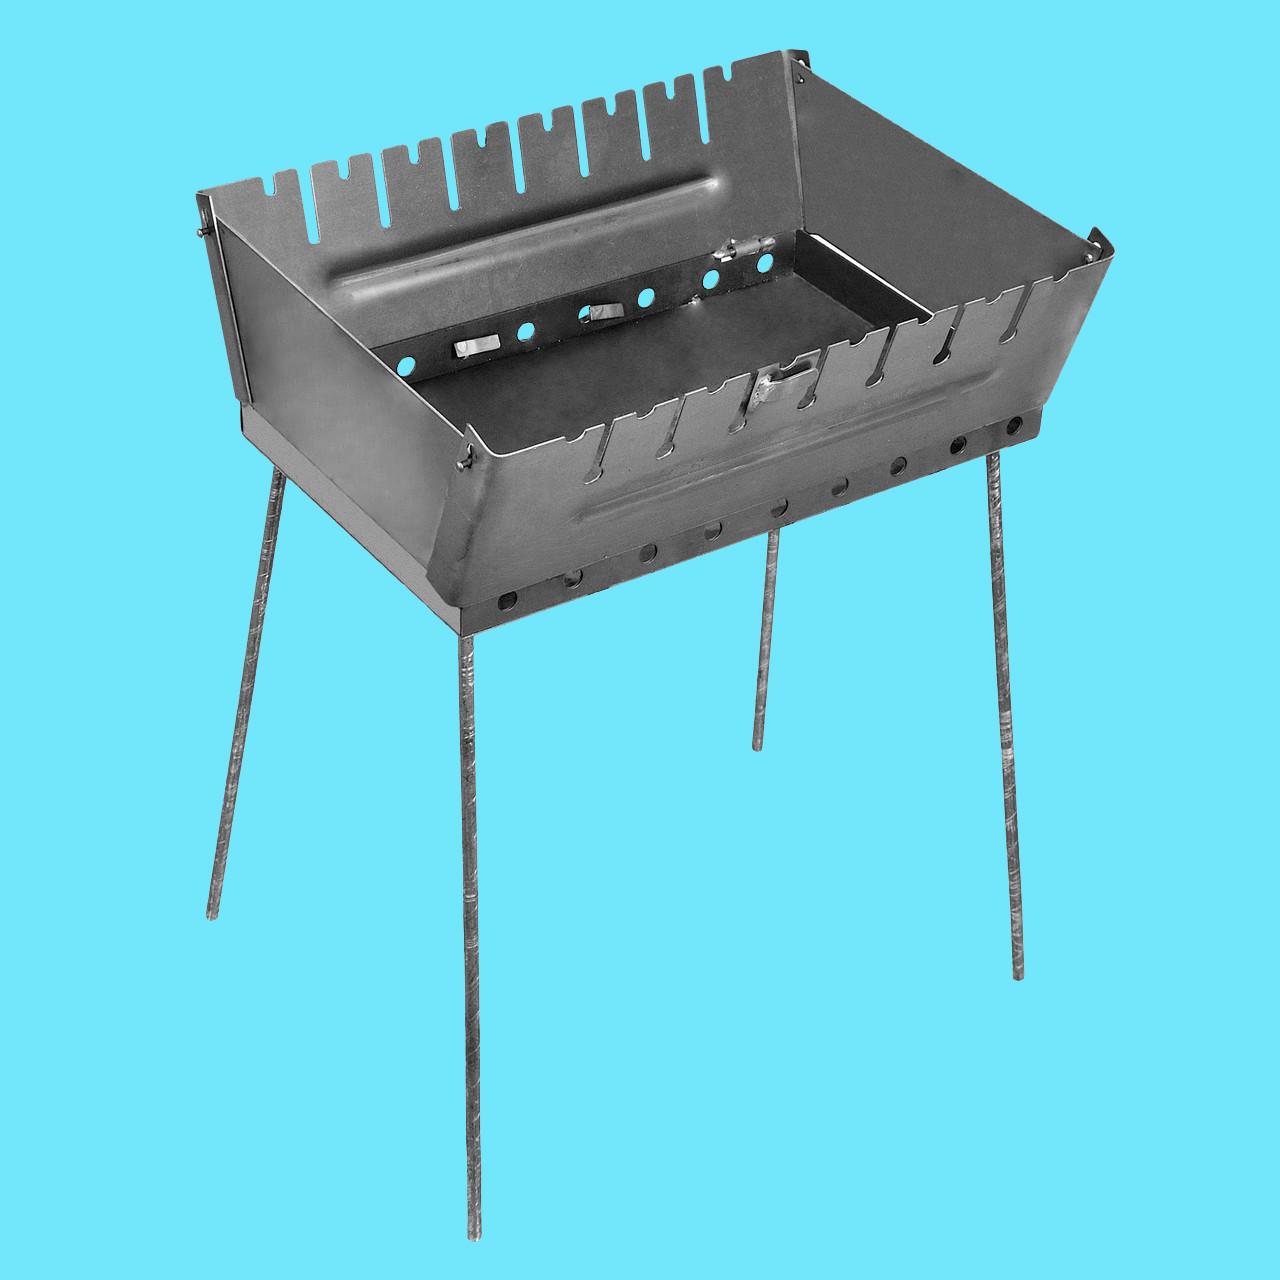 Мангал - чемодан 2 мм на 8 шампуров